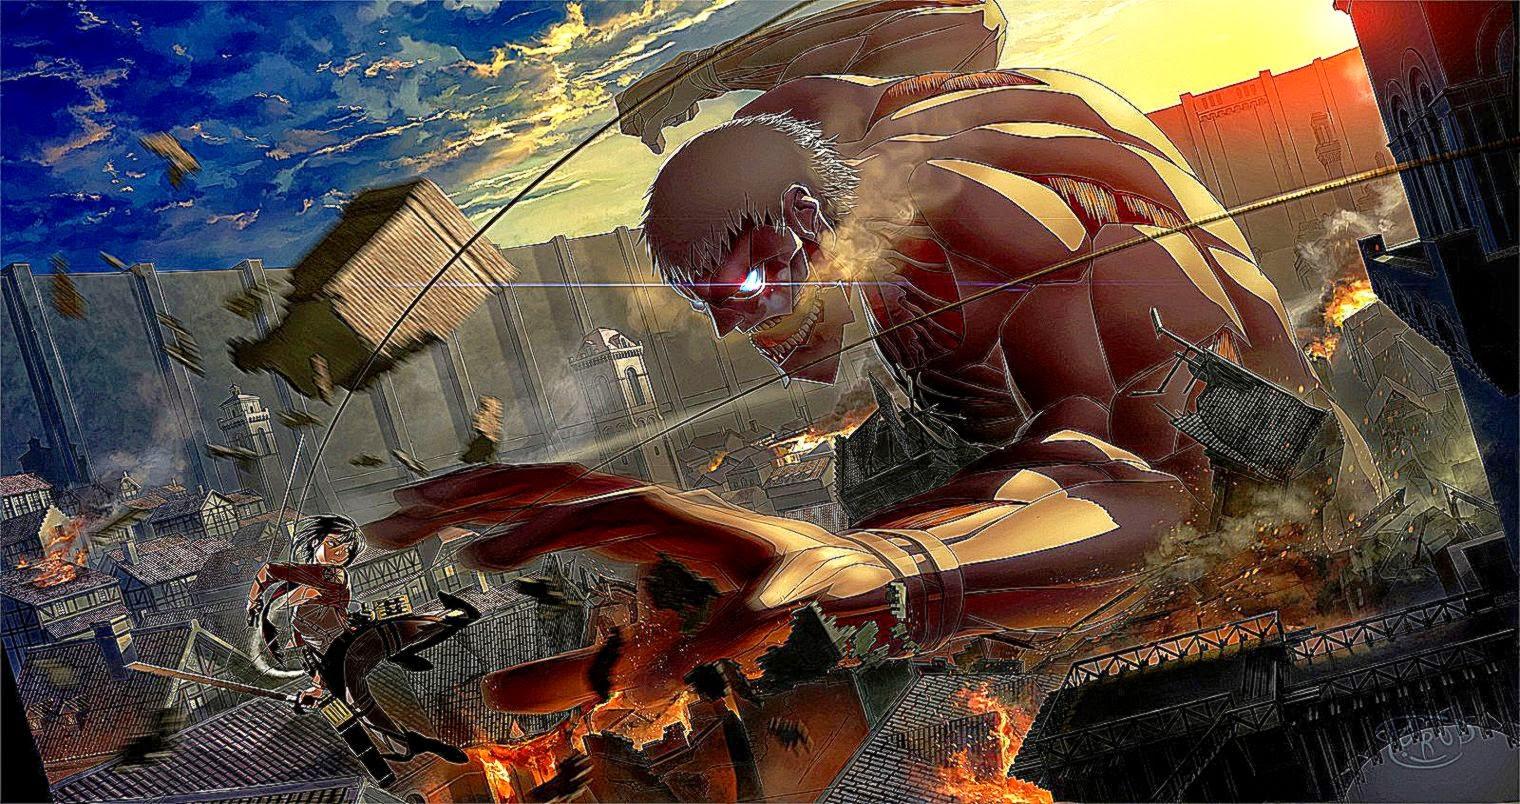 Attack On Titan Hd Wallpaper Best Wallpapers